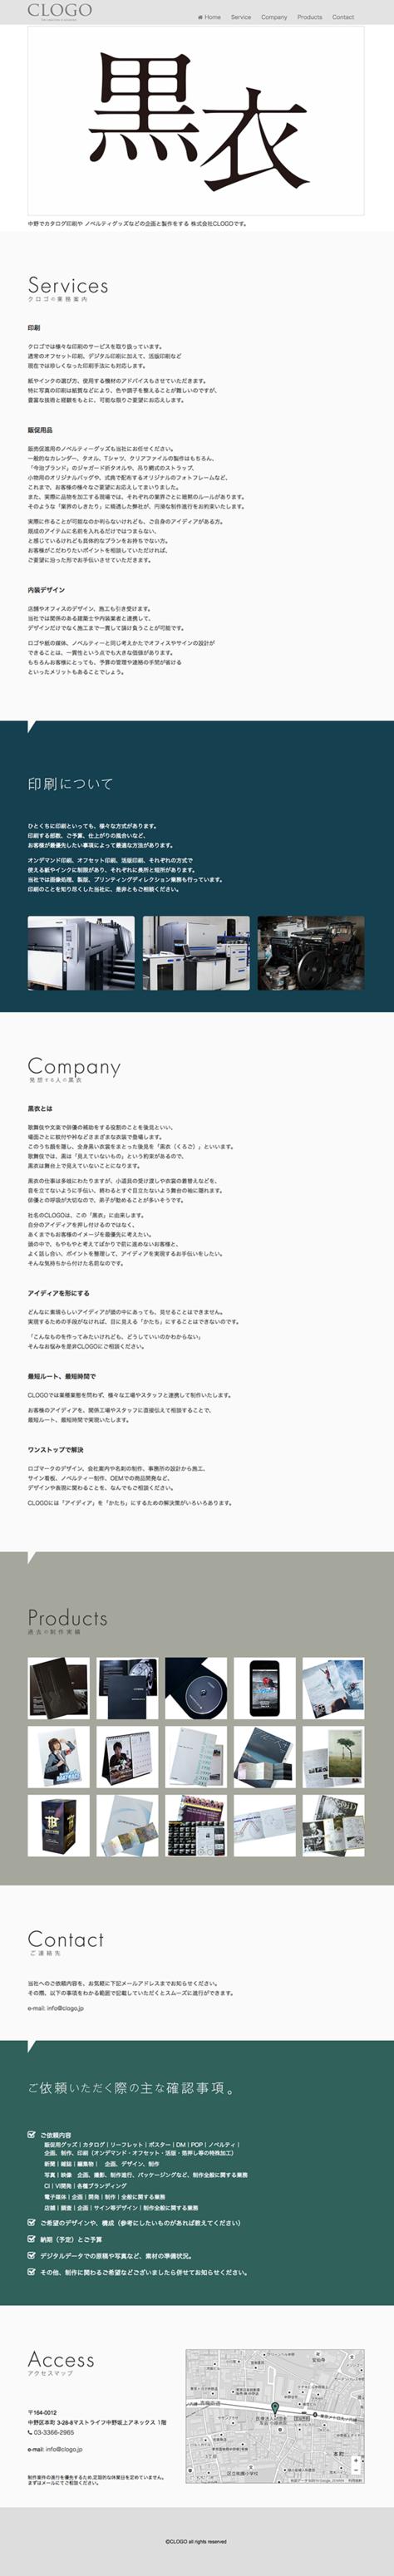 http://clogo.jp/